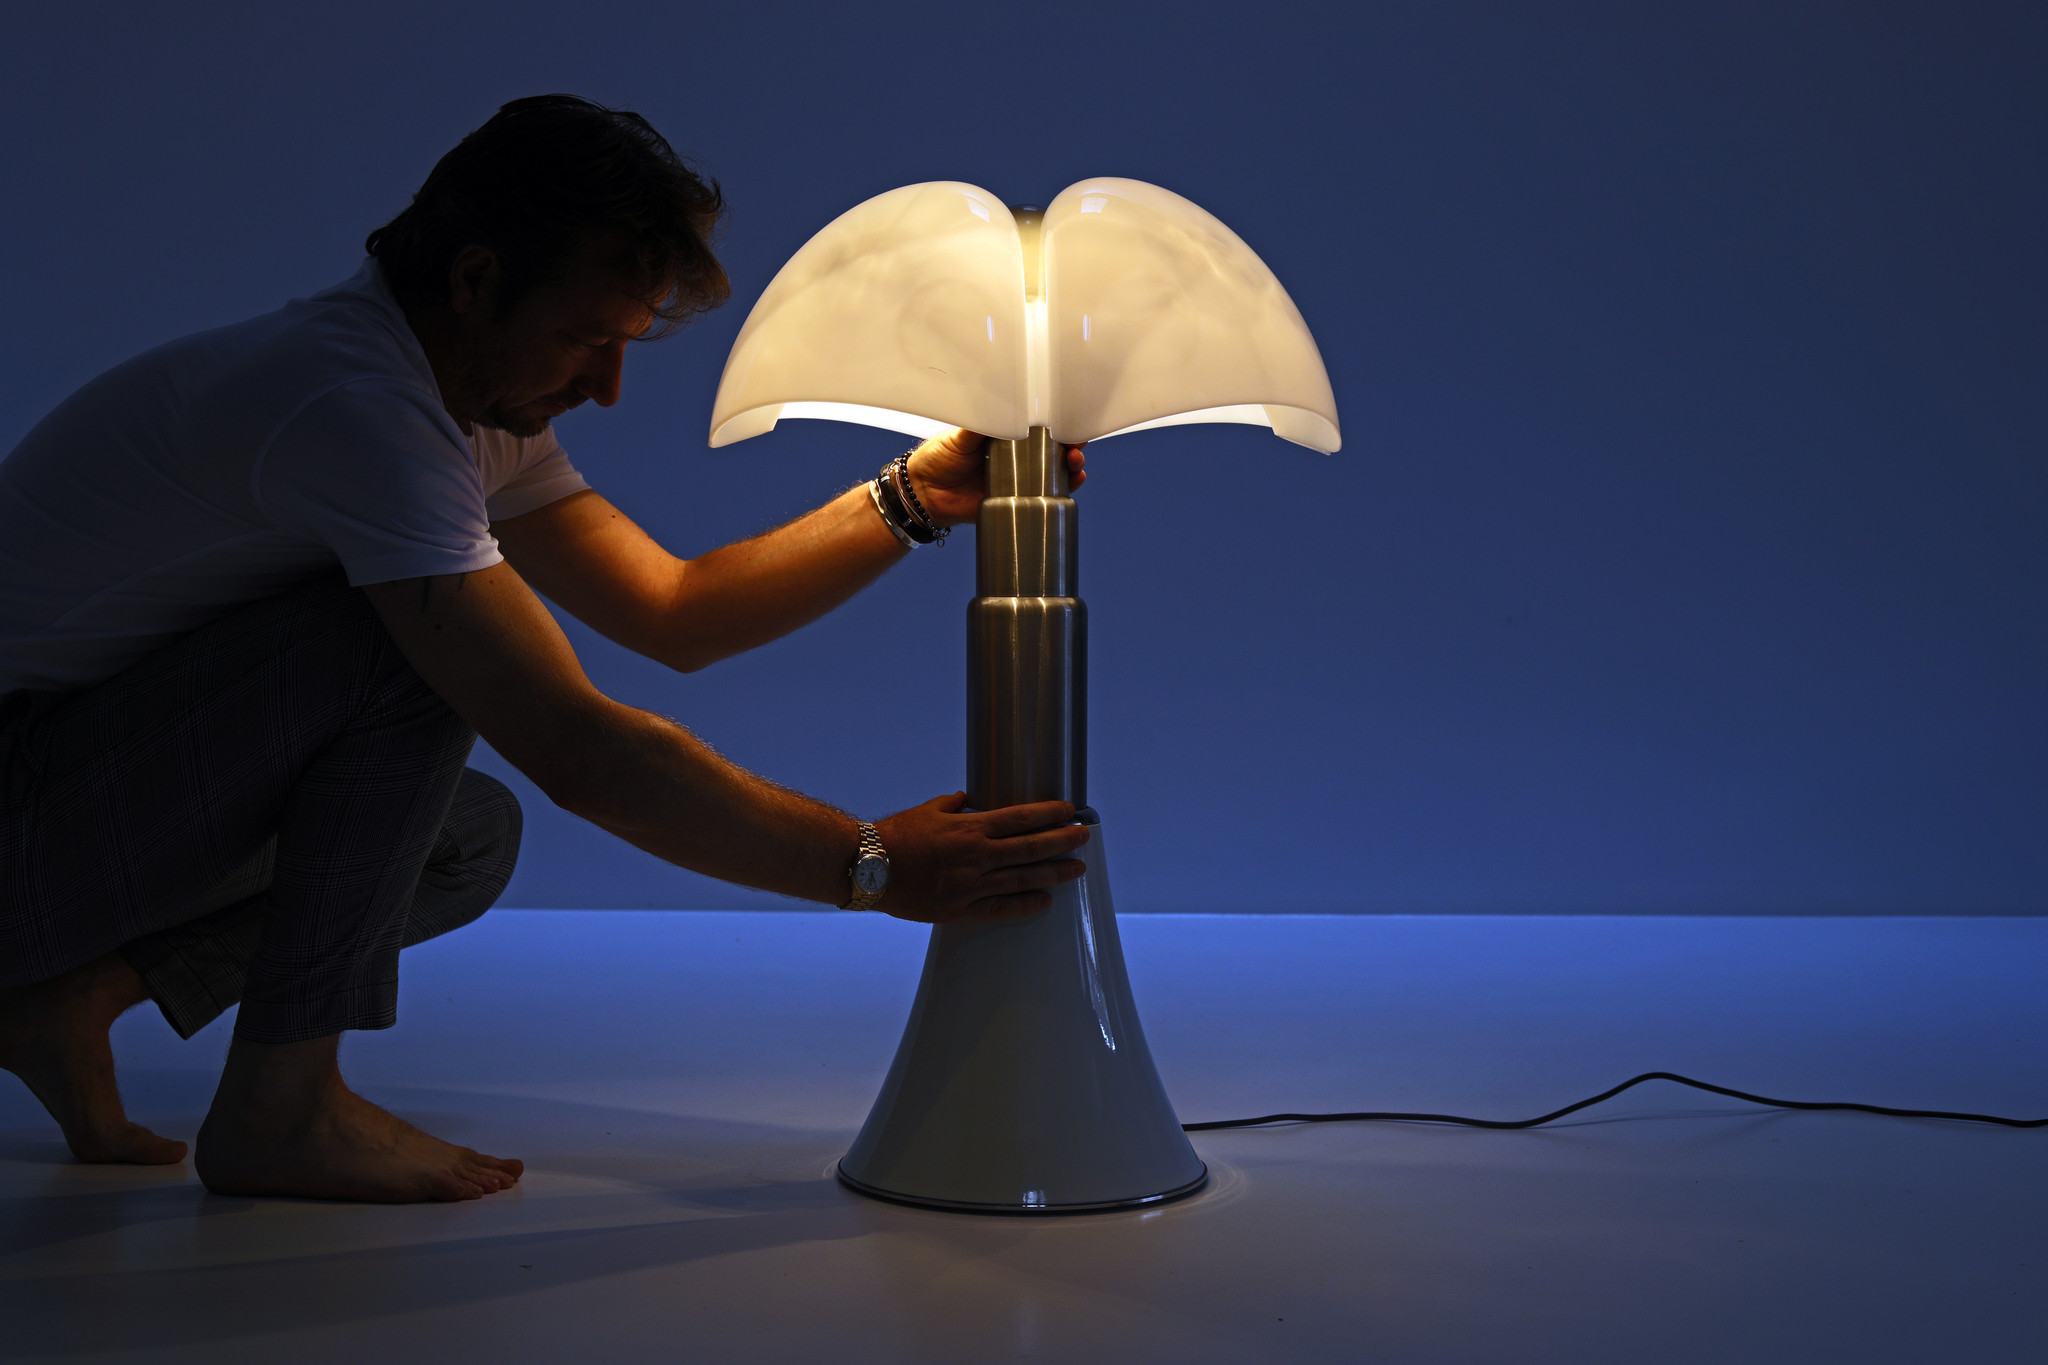 VINTAGE PIPISTRELLO LAMP